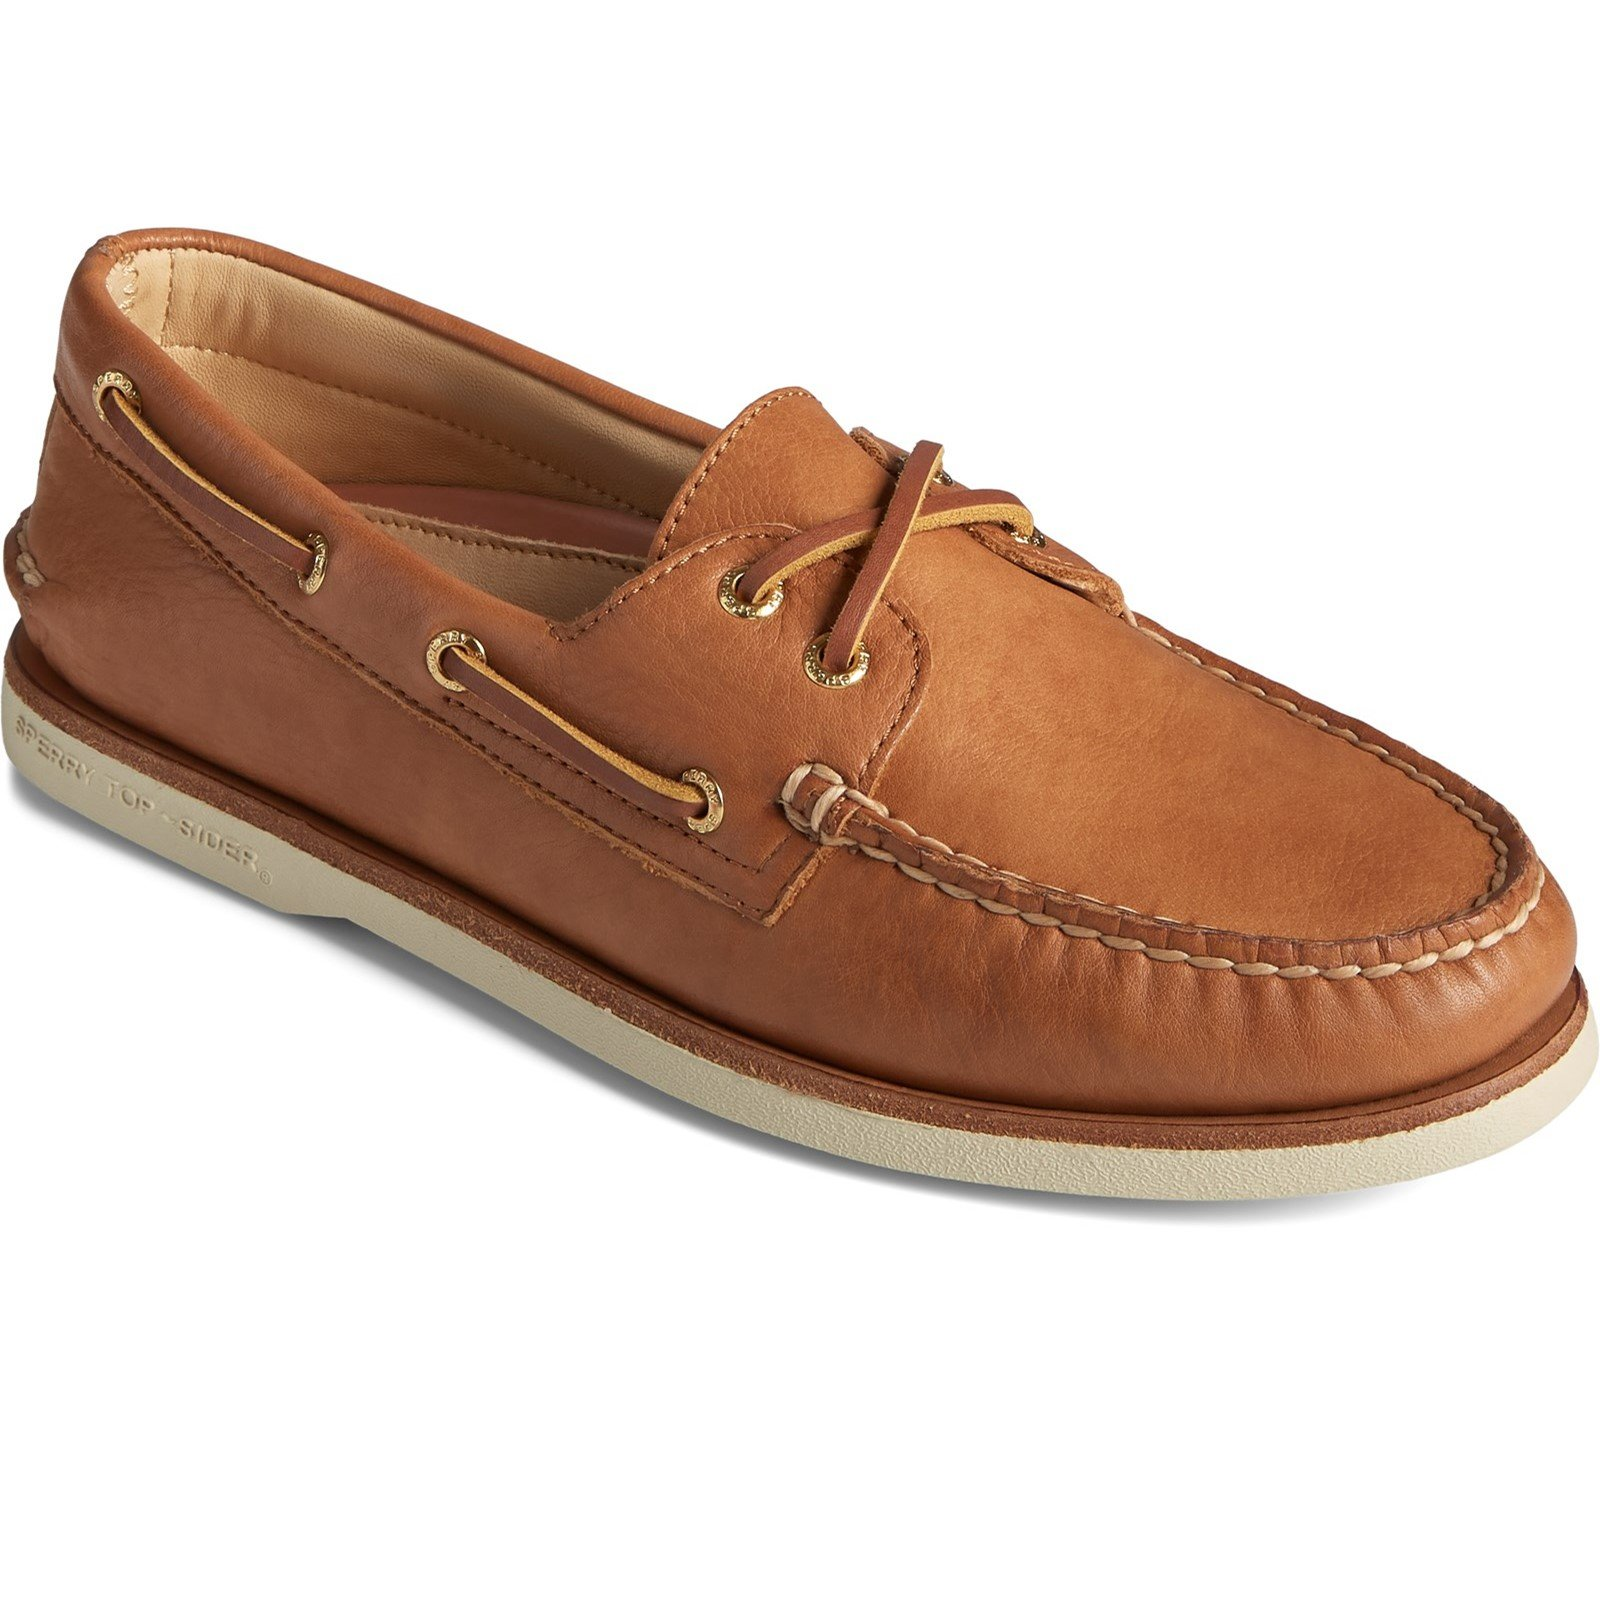 Sperry Men's A/O 2-Eye Boat Shoe Various Colours 32926 - Tan 9